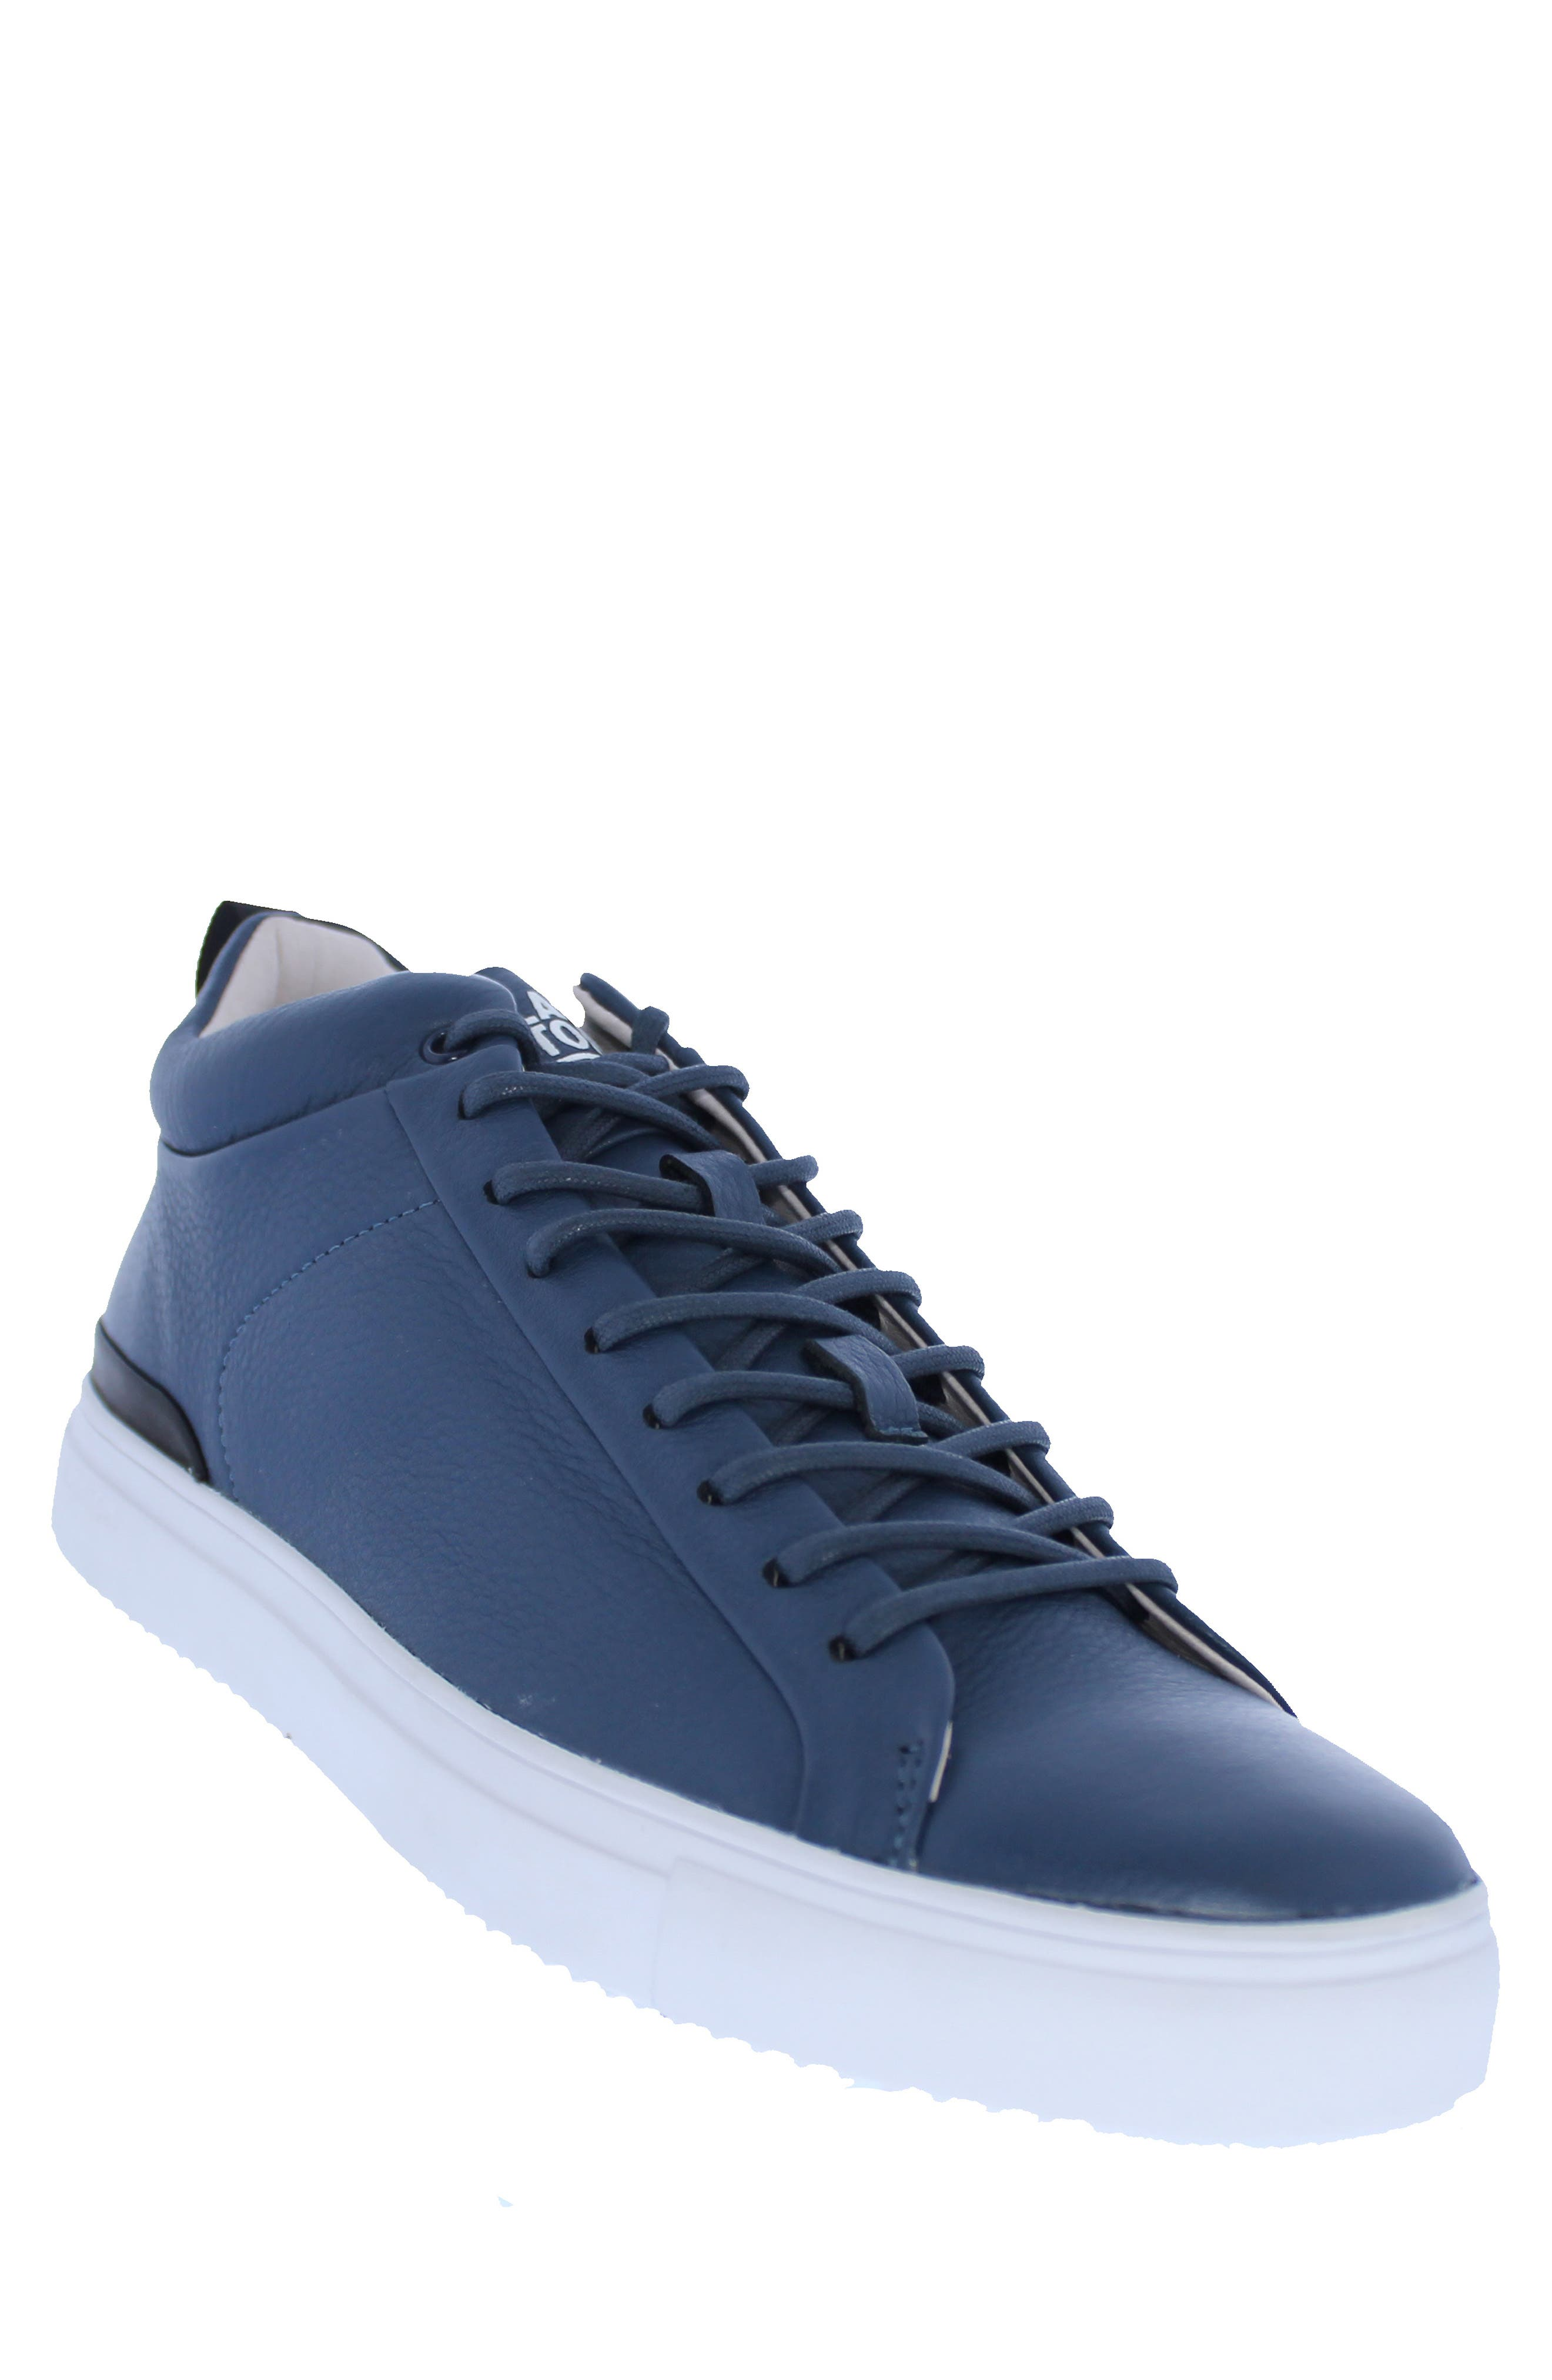 Tg16 Mid Top Sneaker